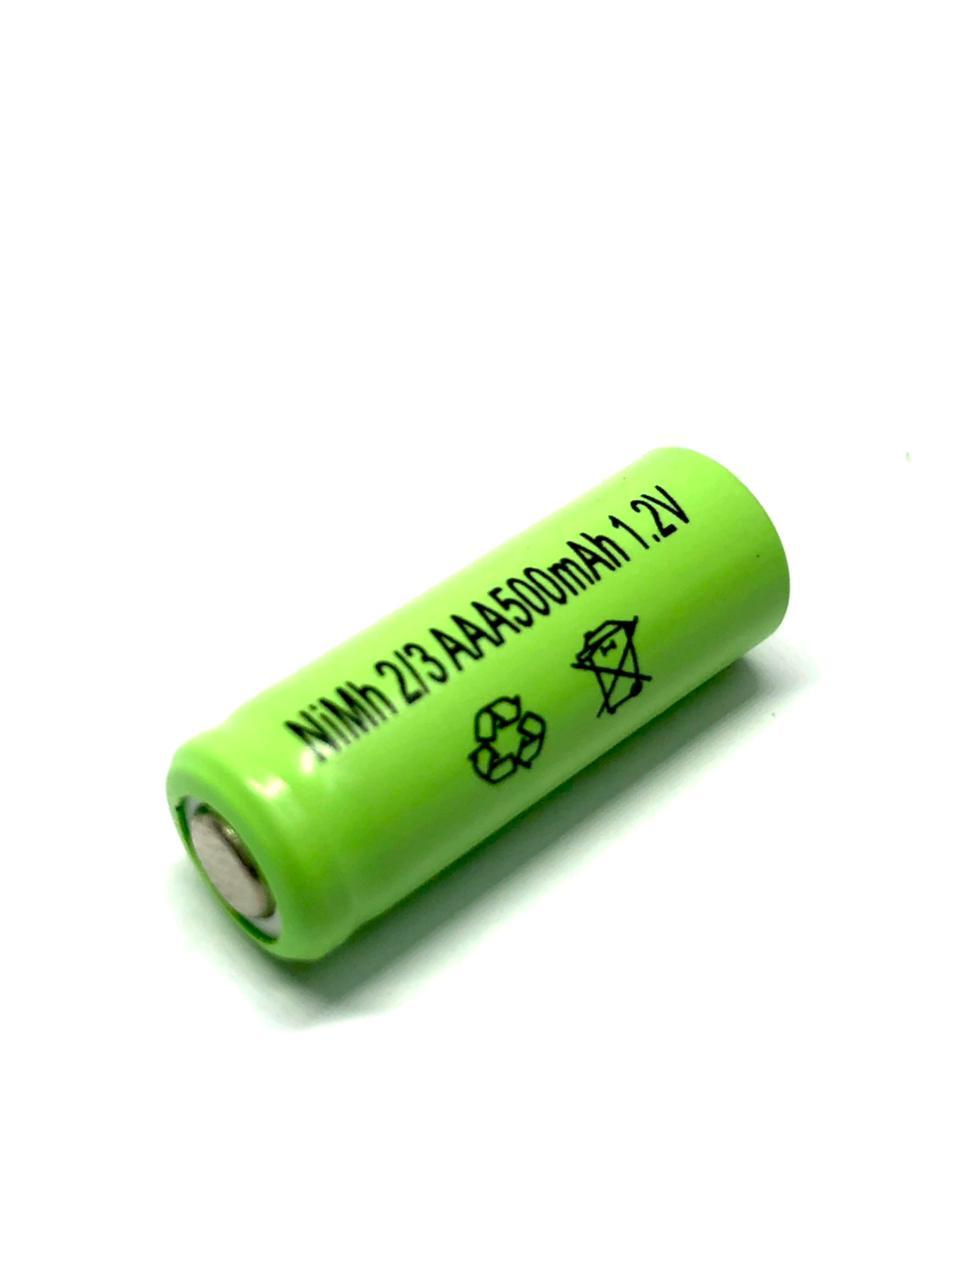 Bateria 2/3aaa 500mah Ni-Mh Planet Battery1,2v